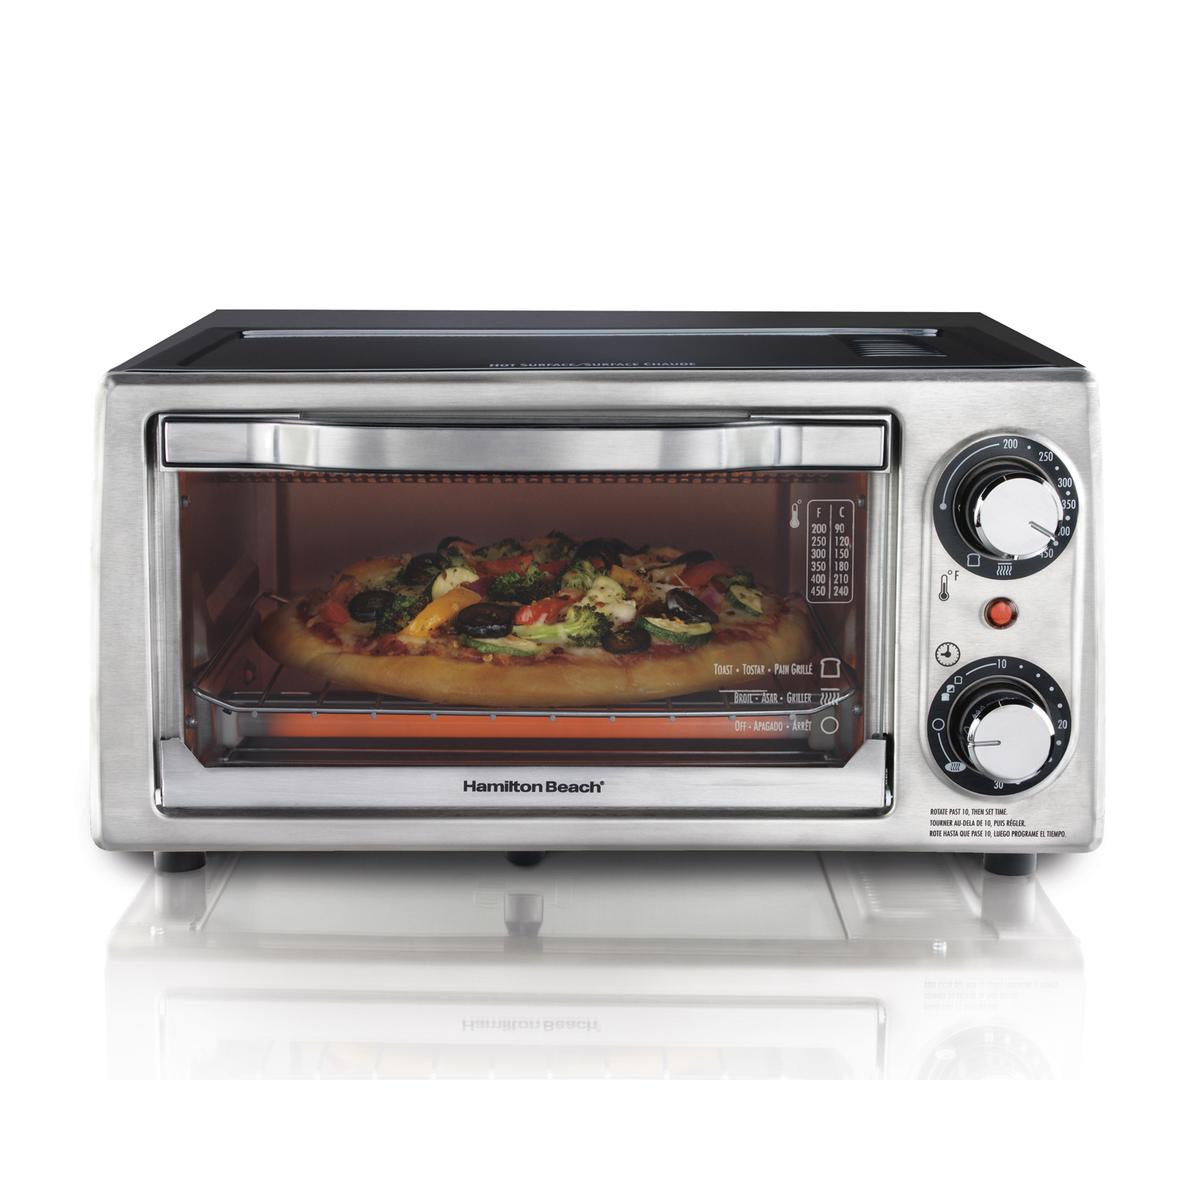 4 Slice Toaster Oven (31137)